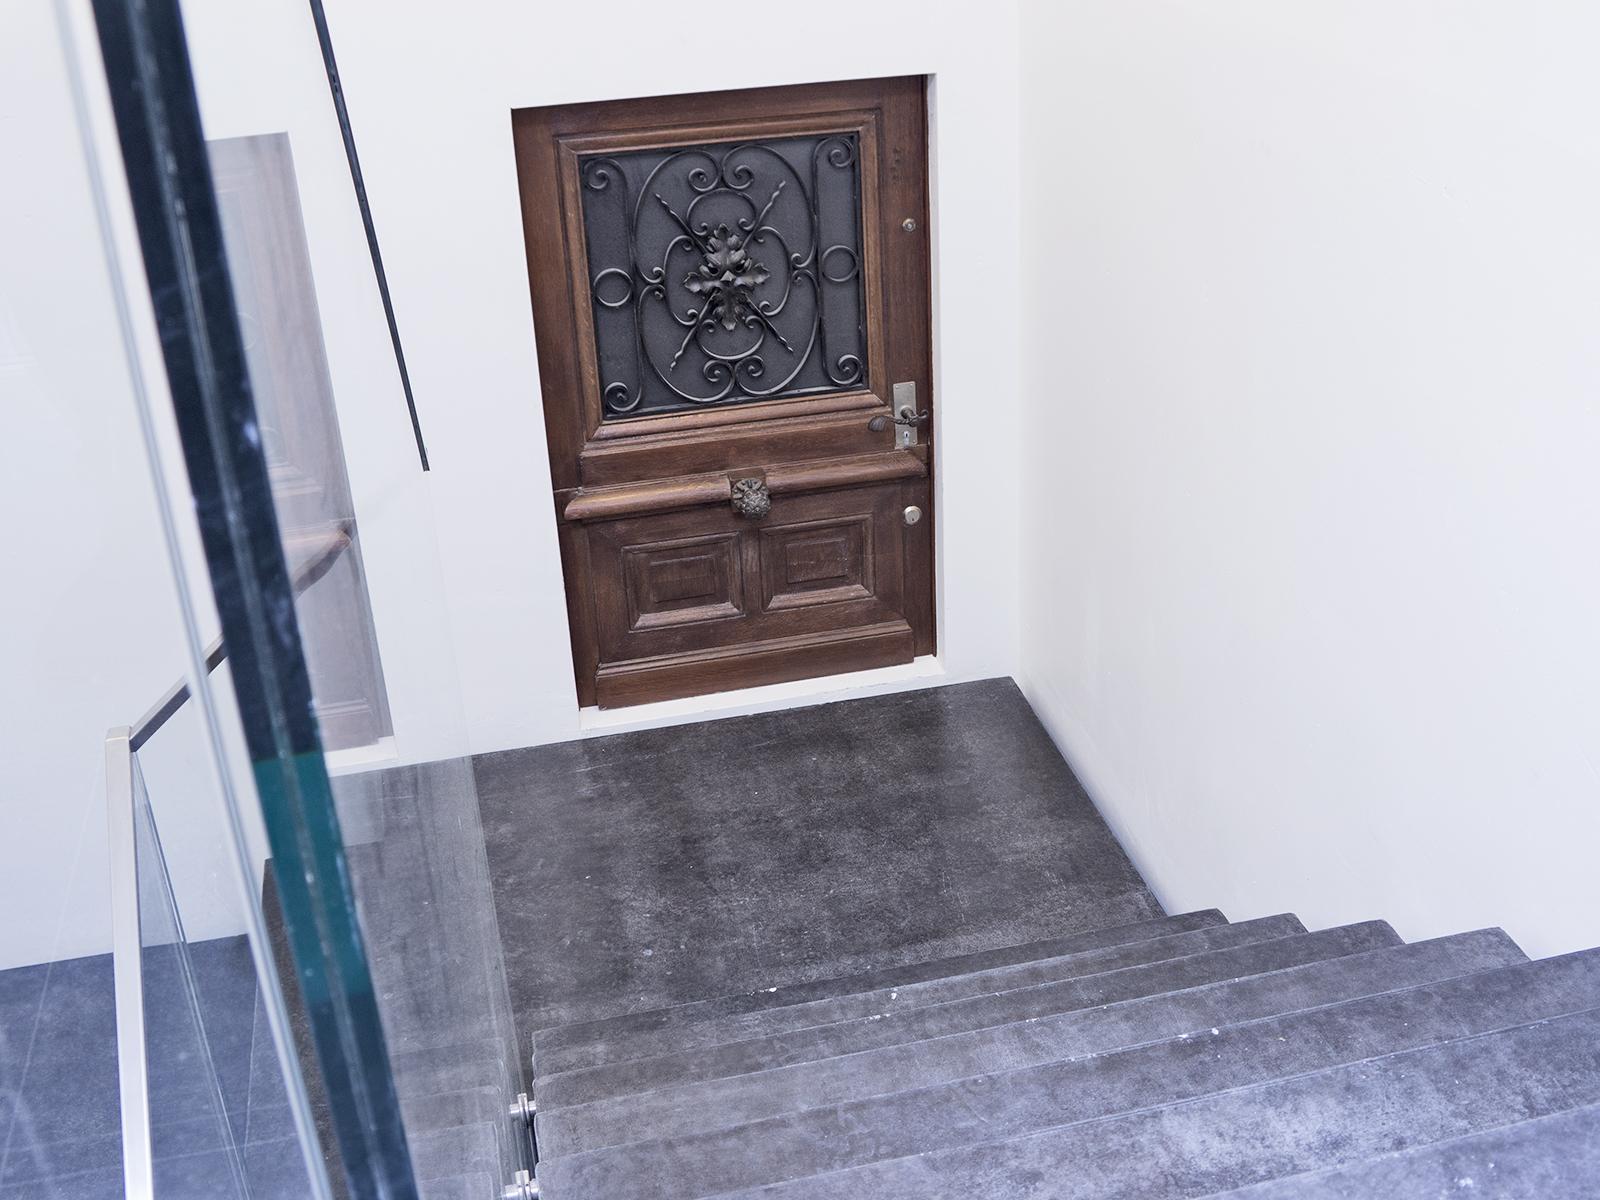 Benoit-Delaunay-artiste-sculptures-2011-Elapsed Time-04